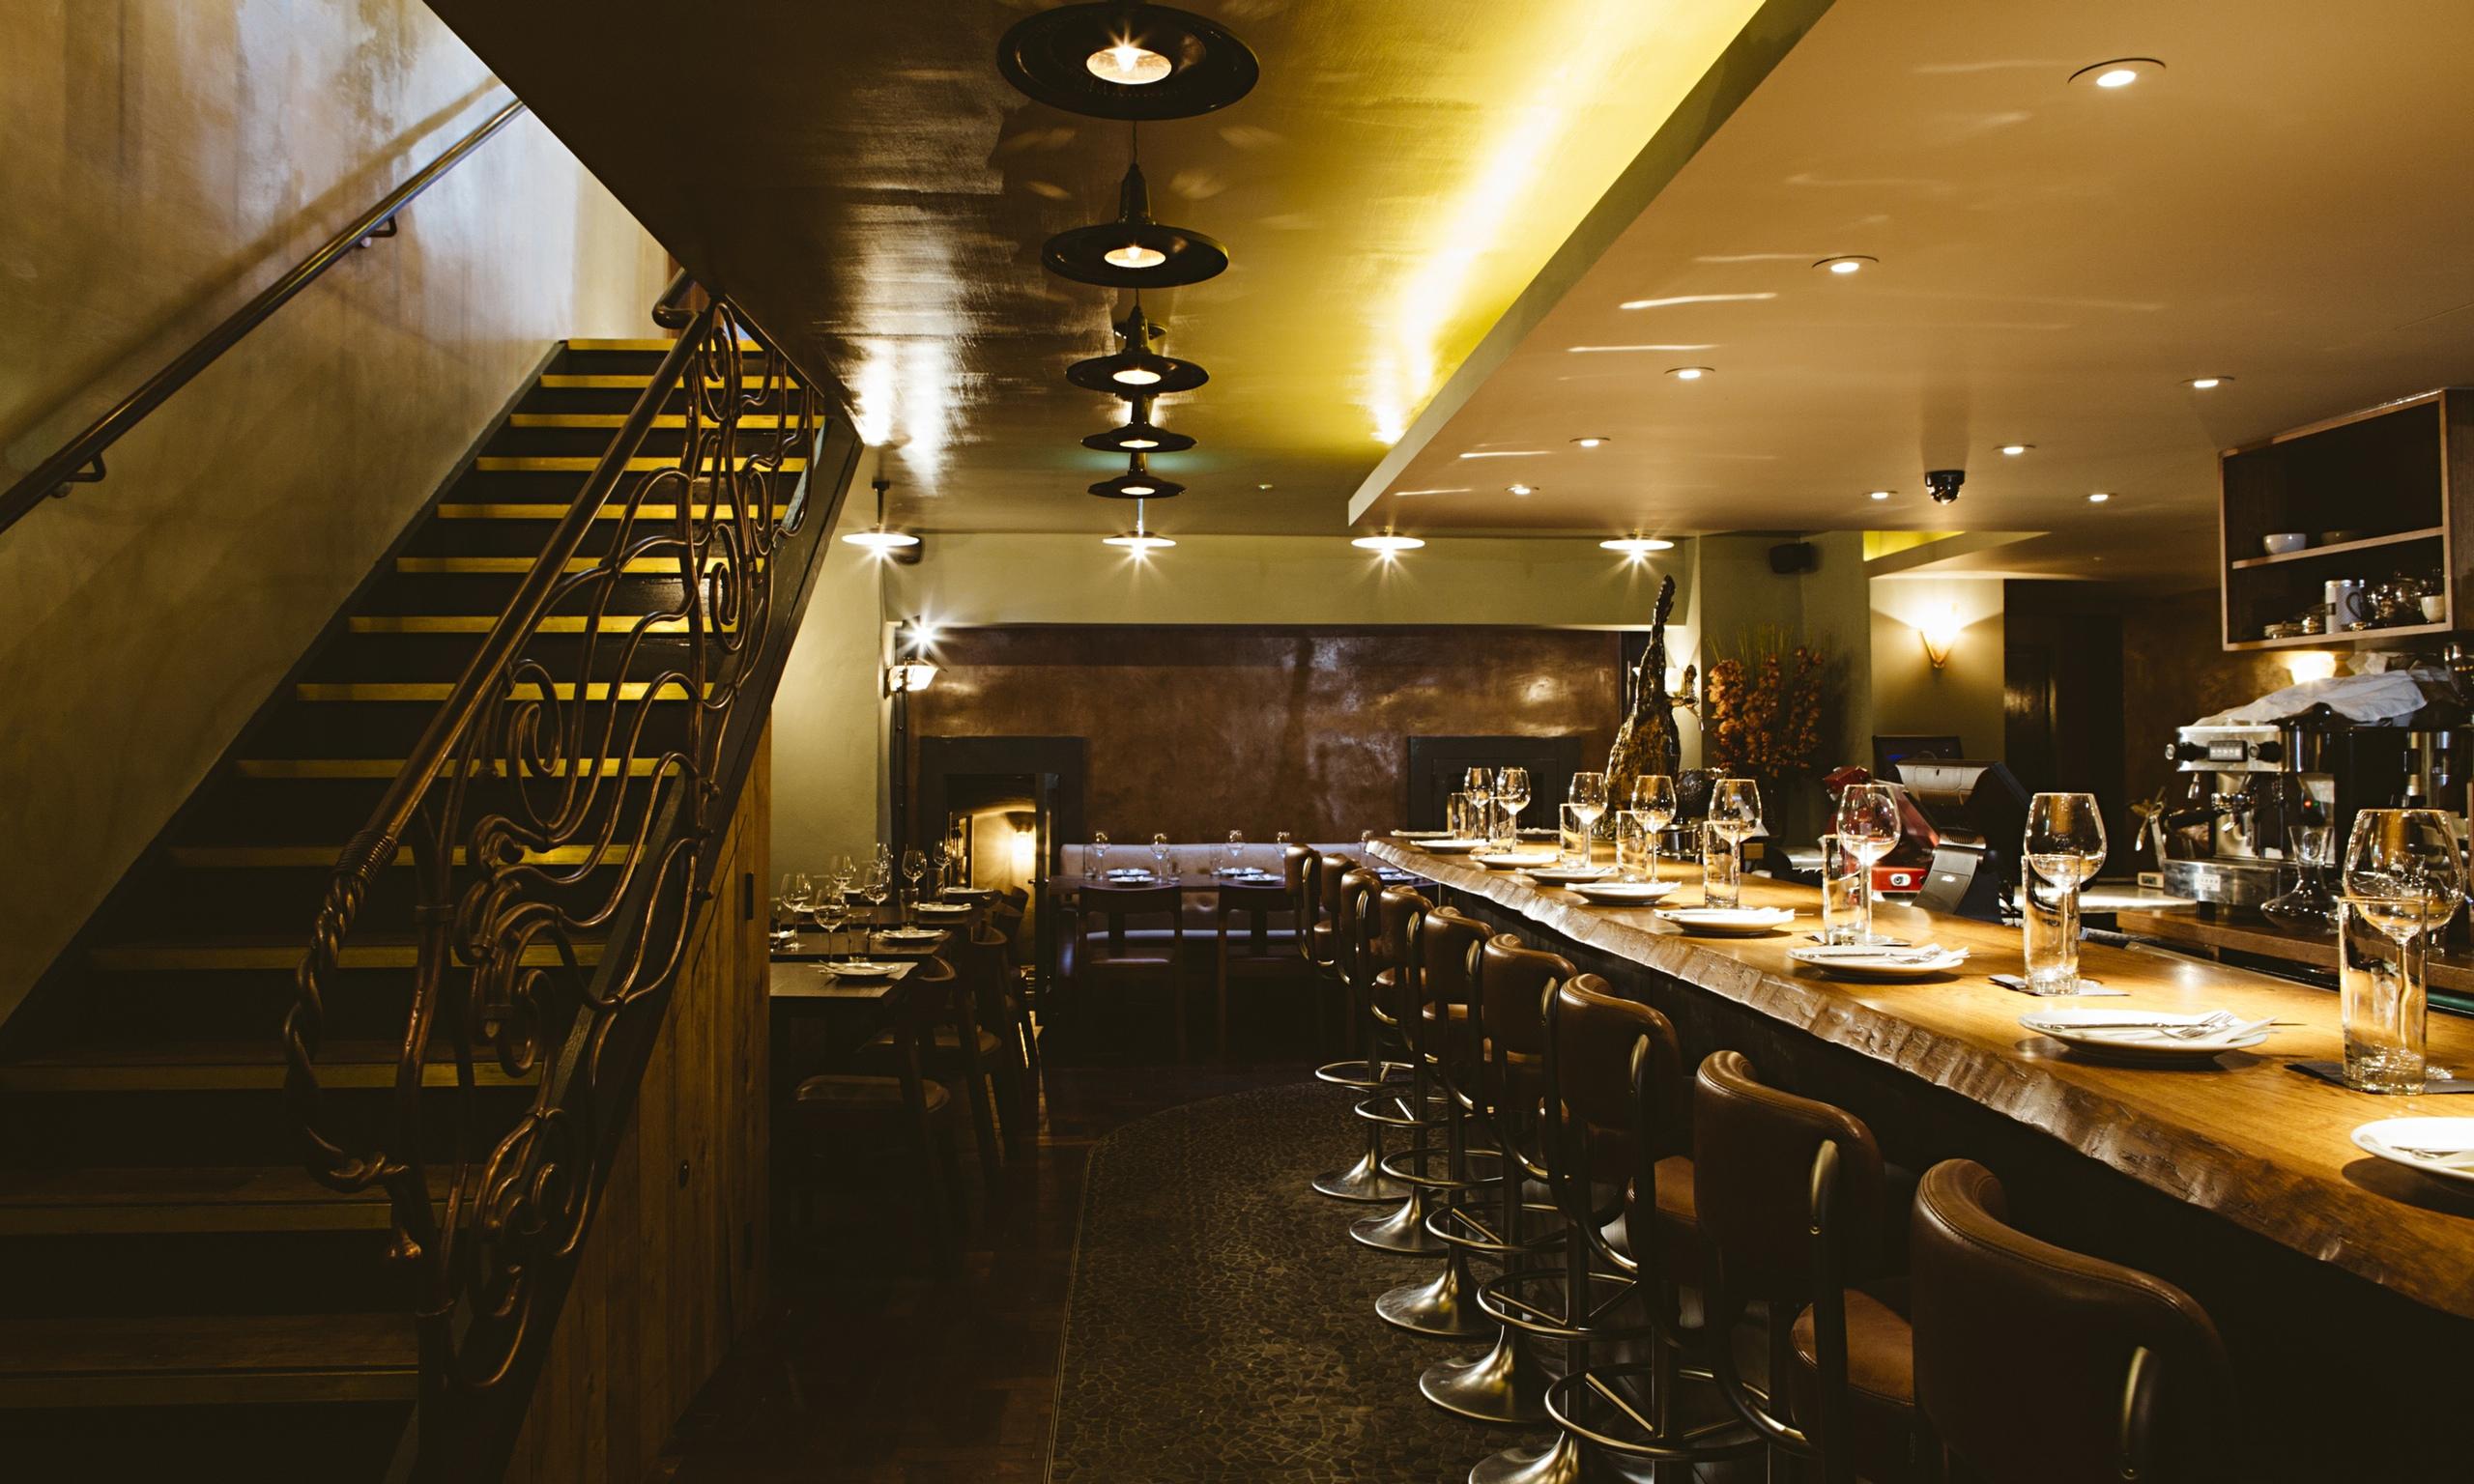 ember yard london  restaurant review marina oloughlin life  style  guardian